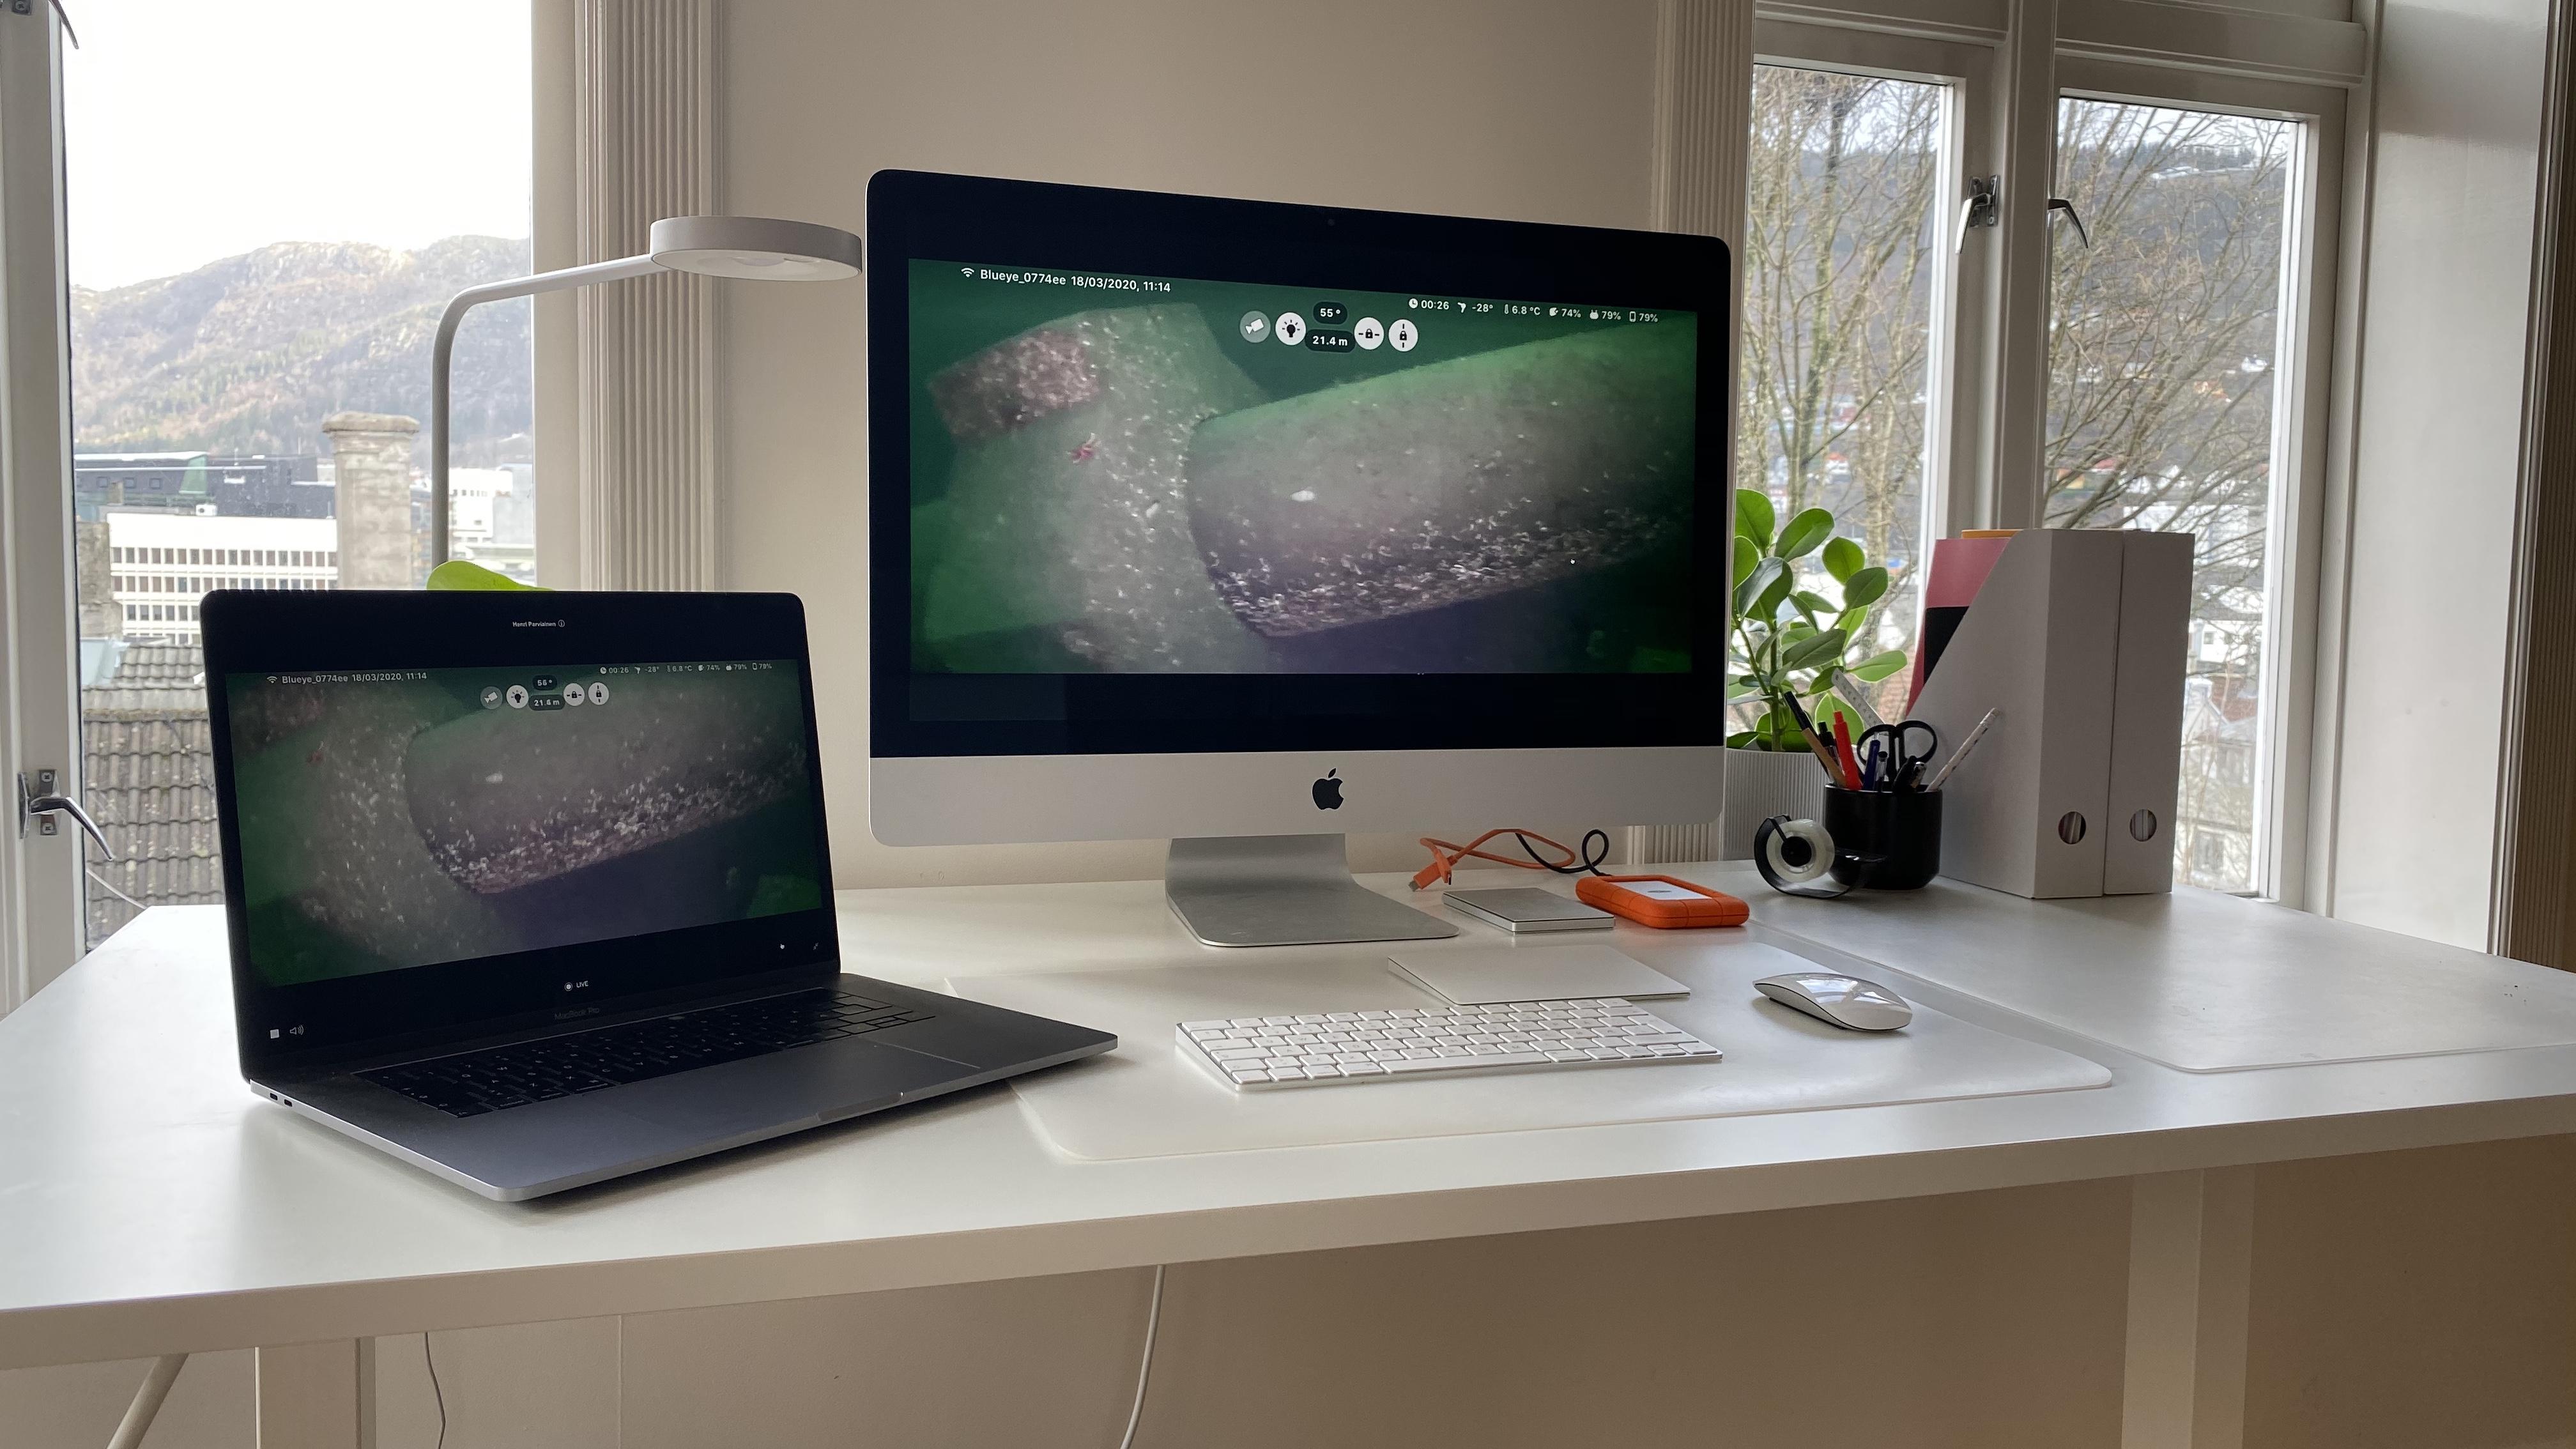 Fra et kontor i Bergen som også følger med på live videostrøm fra rørene i Korsvika